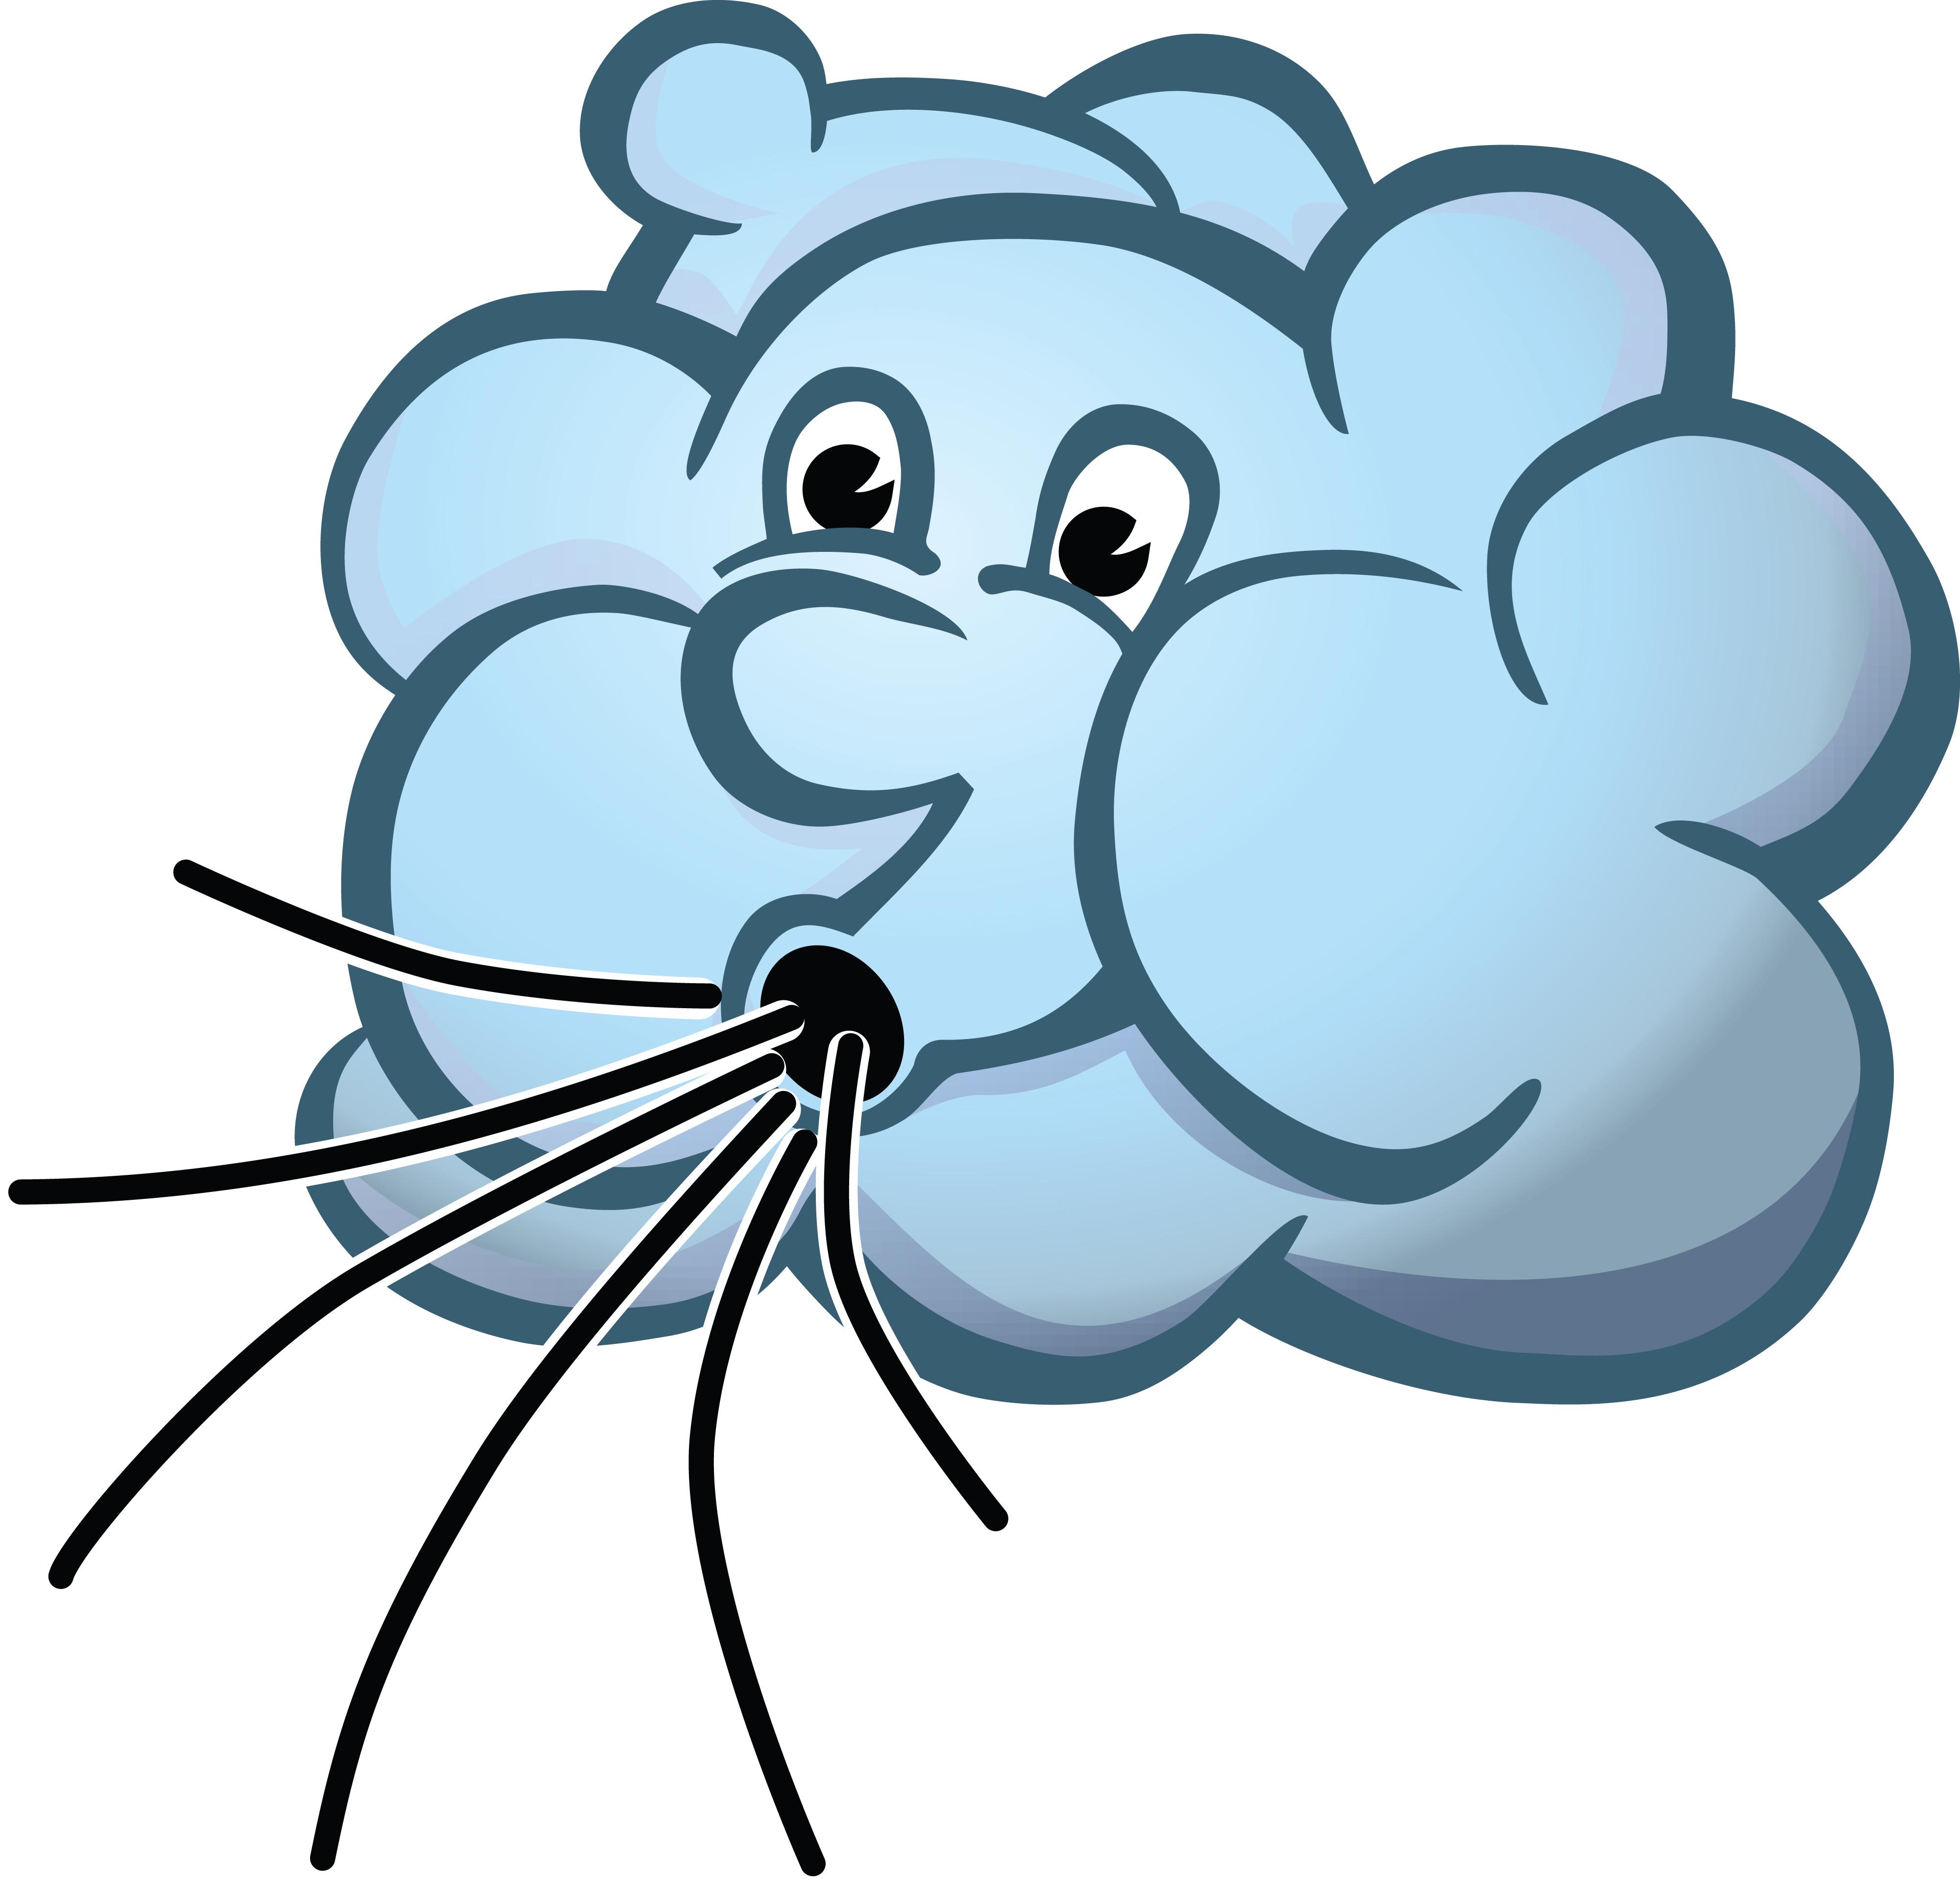 free clipart of a cloud blowing wind rh free clipartof com clipart wind turbine vestas clipart windows gratuit